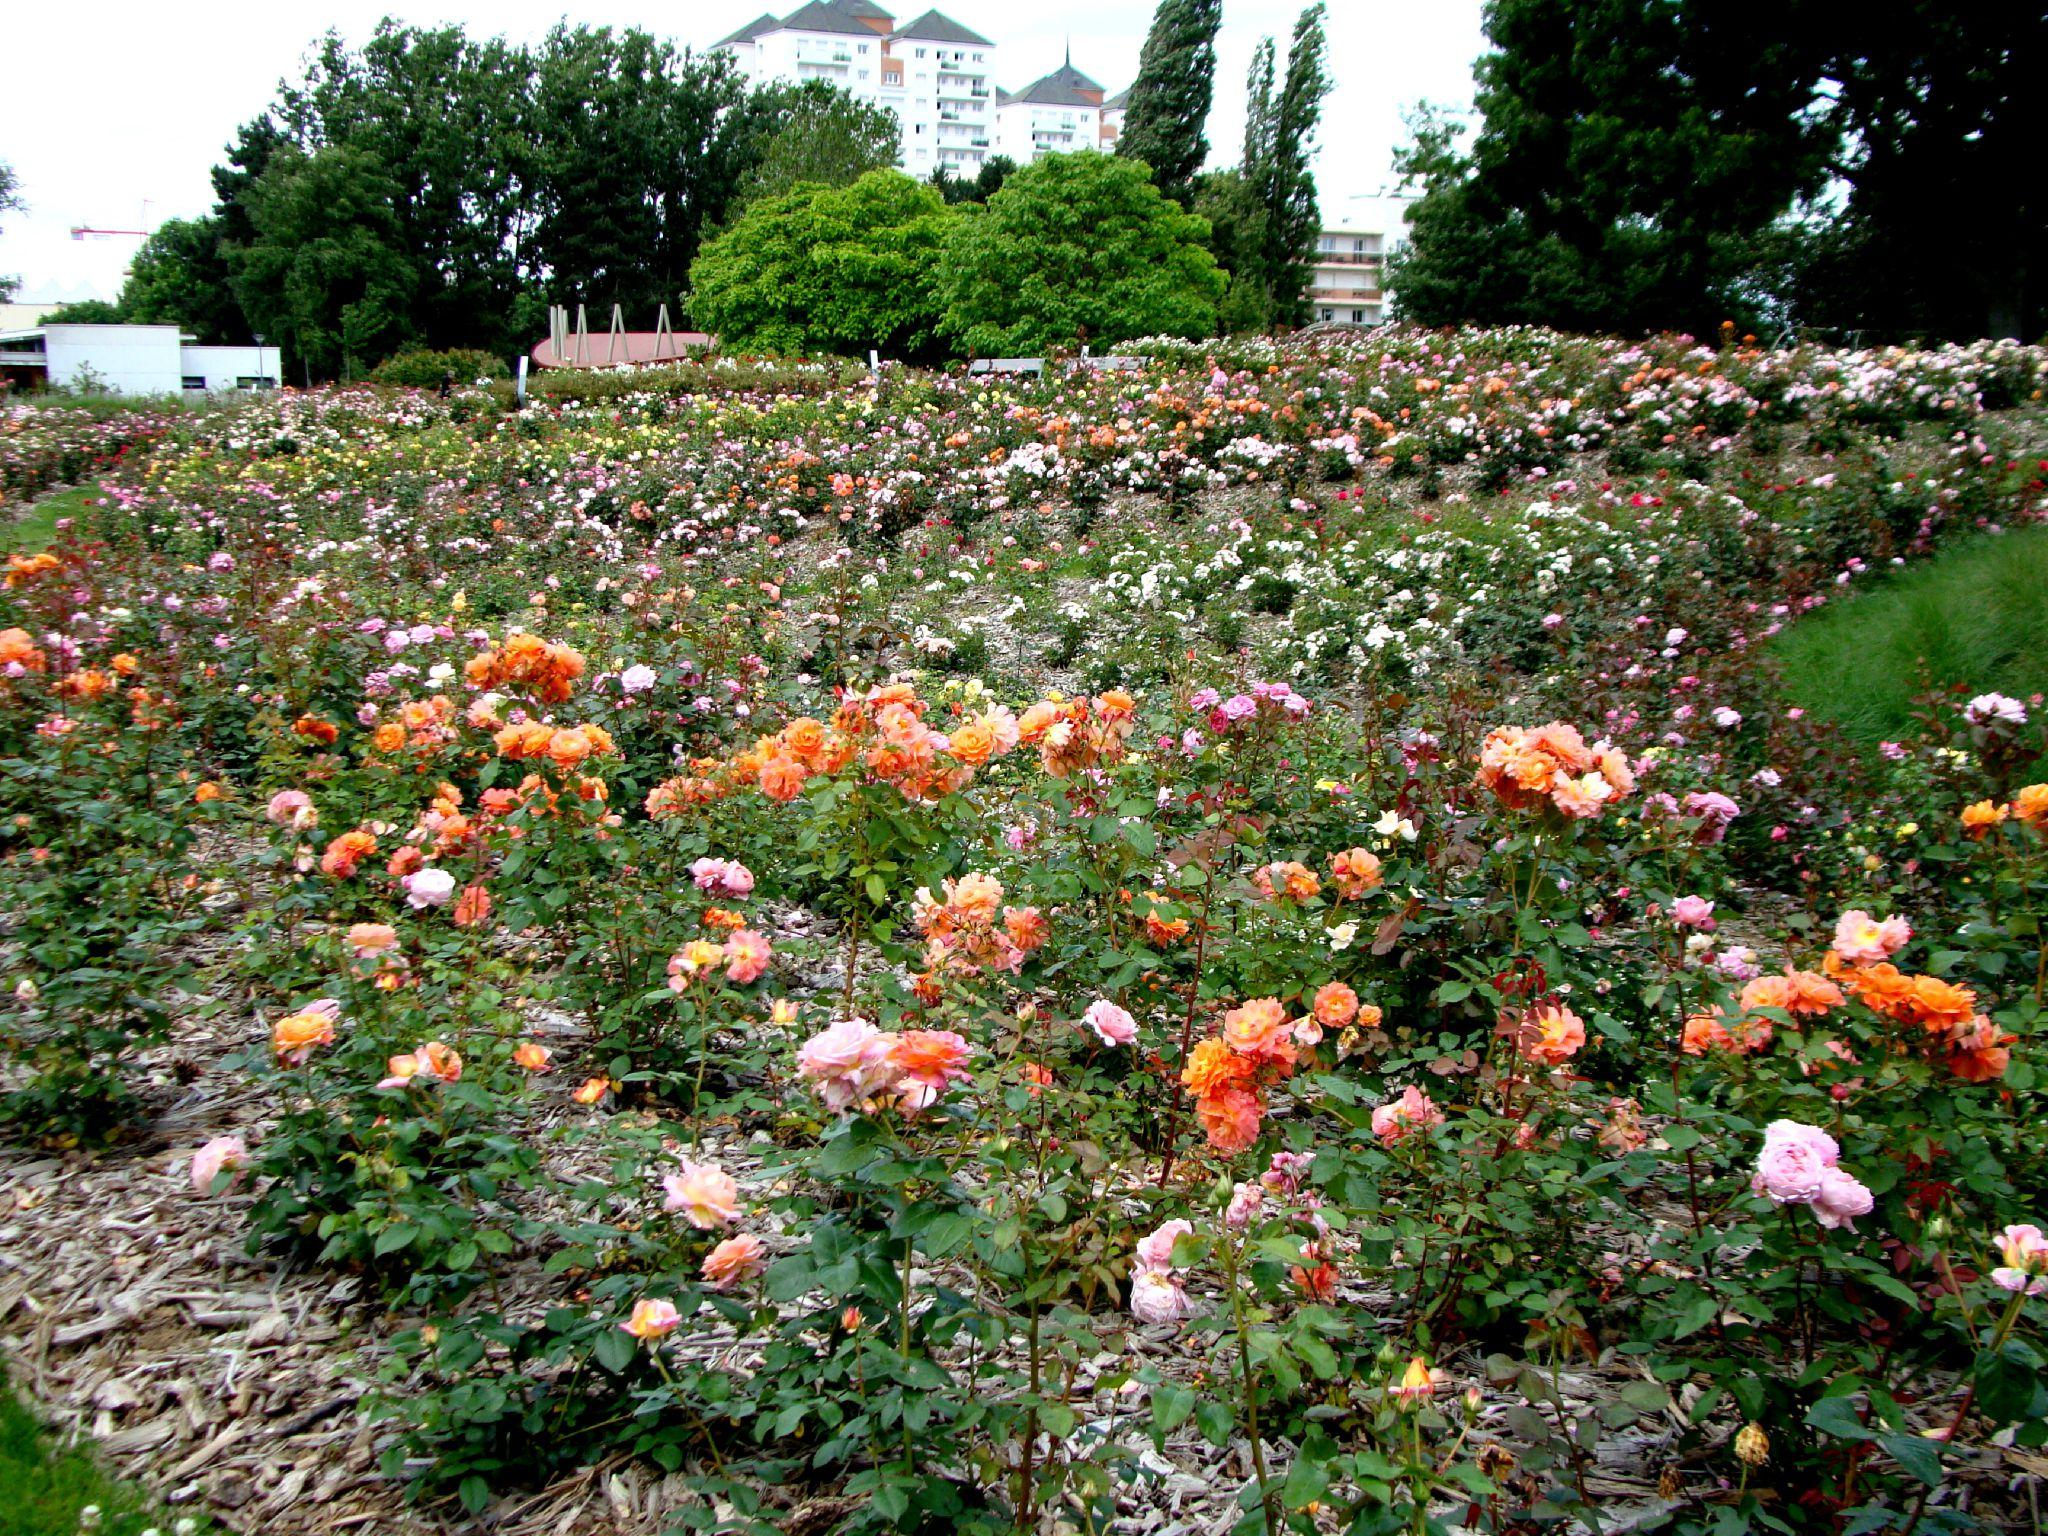 La roseraie de Grand-Quevilly - MariePhotosLaure